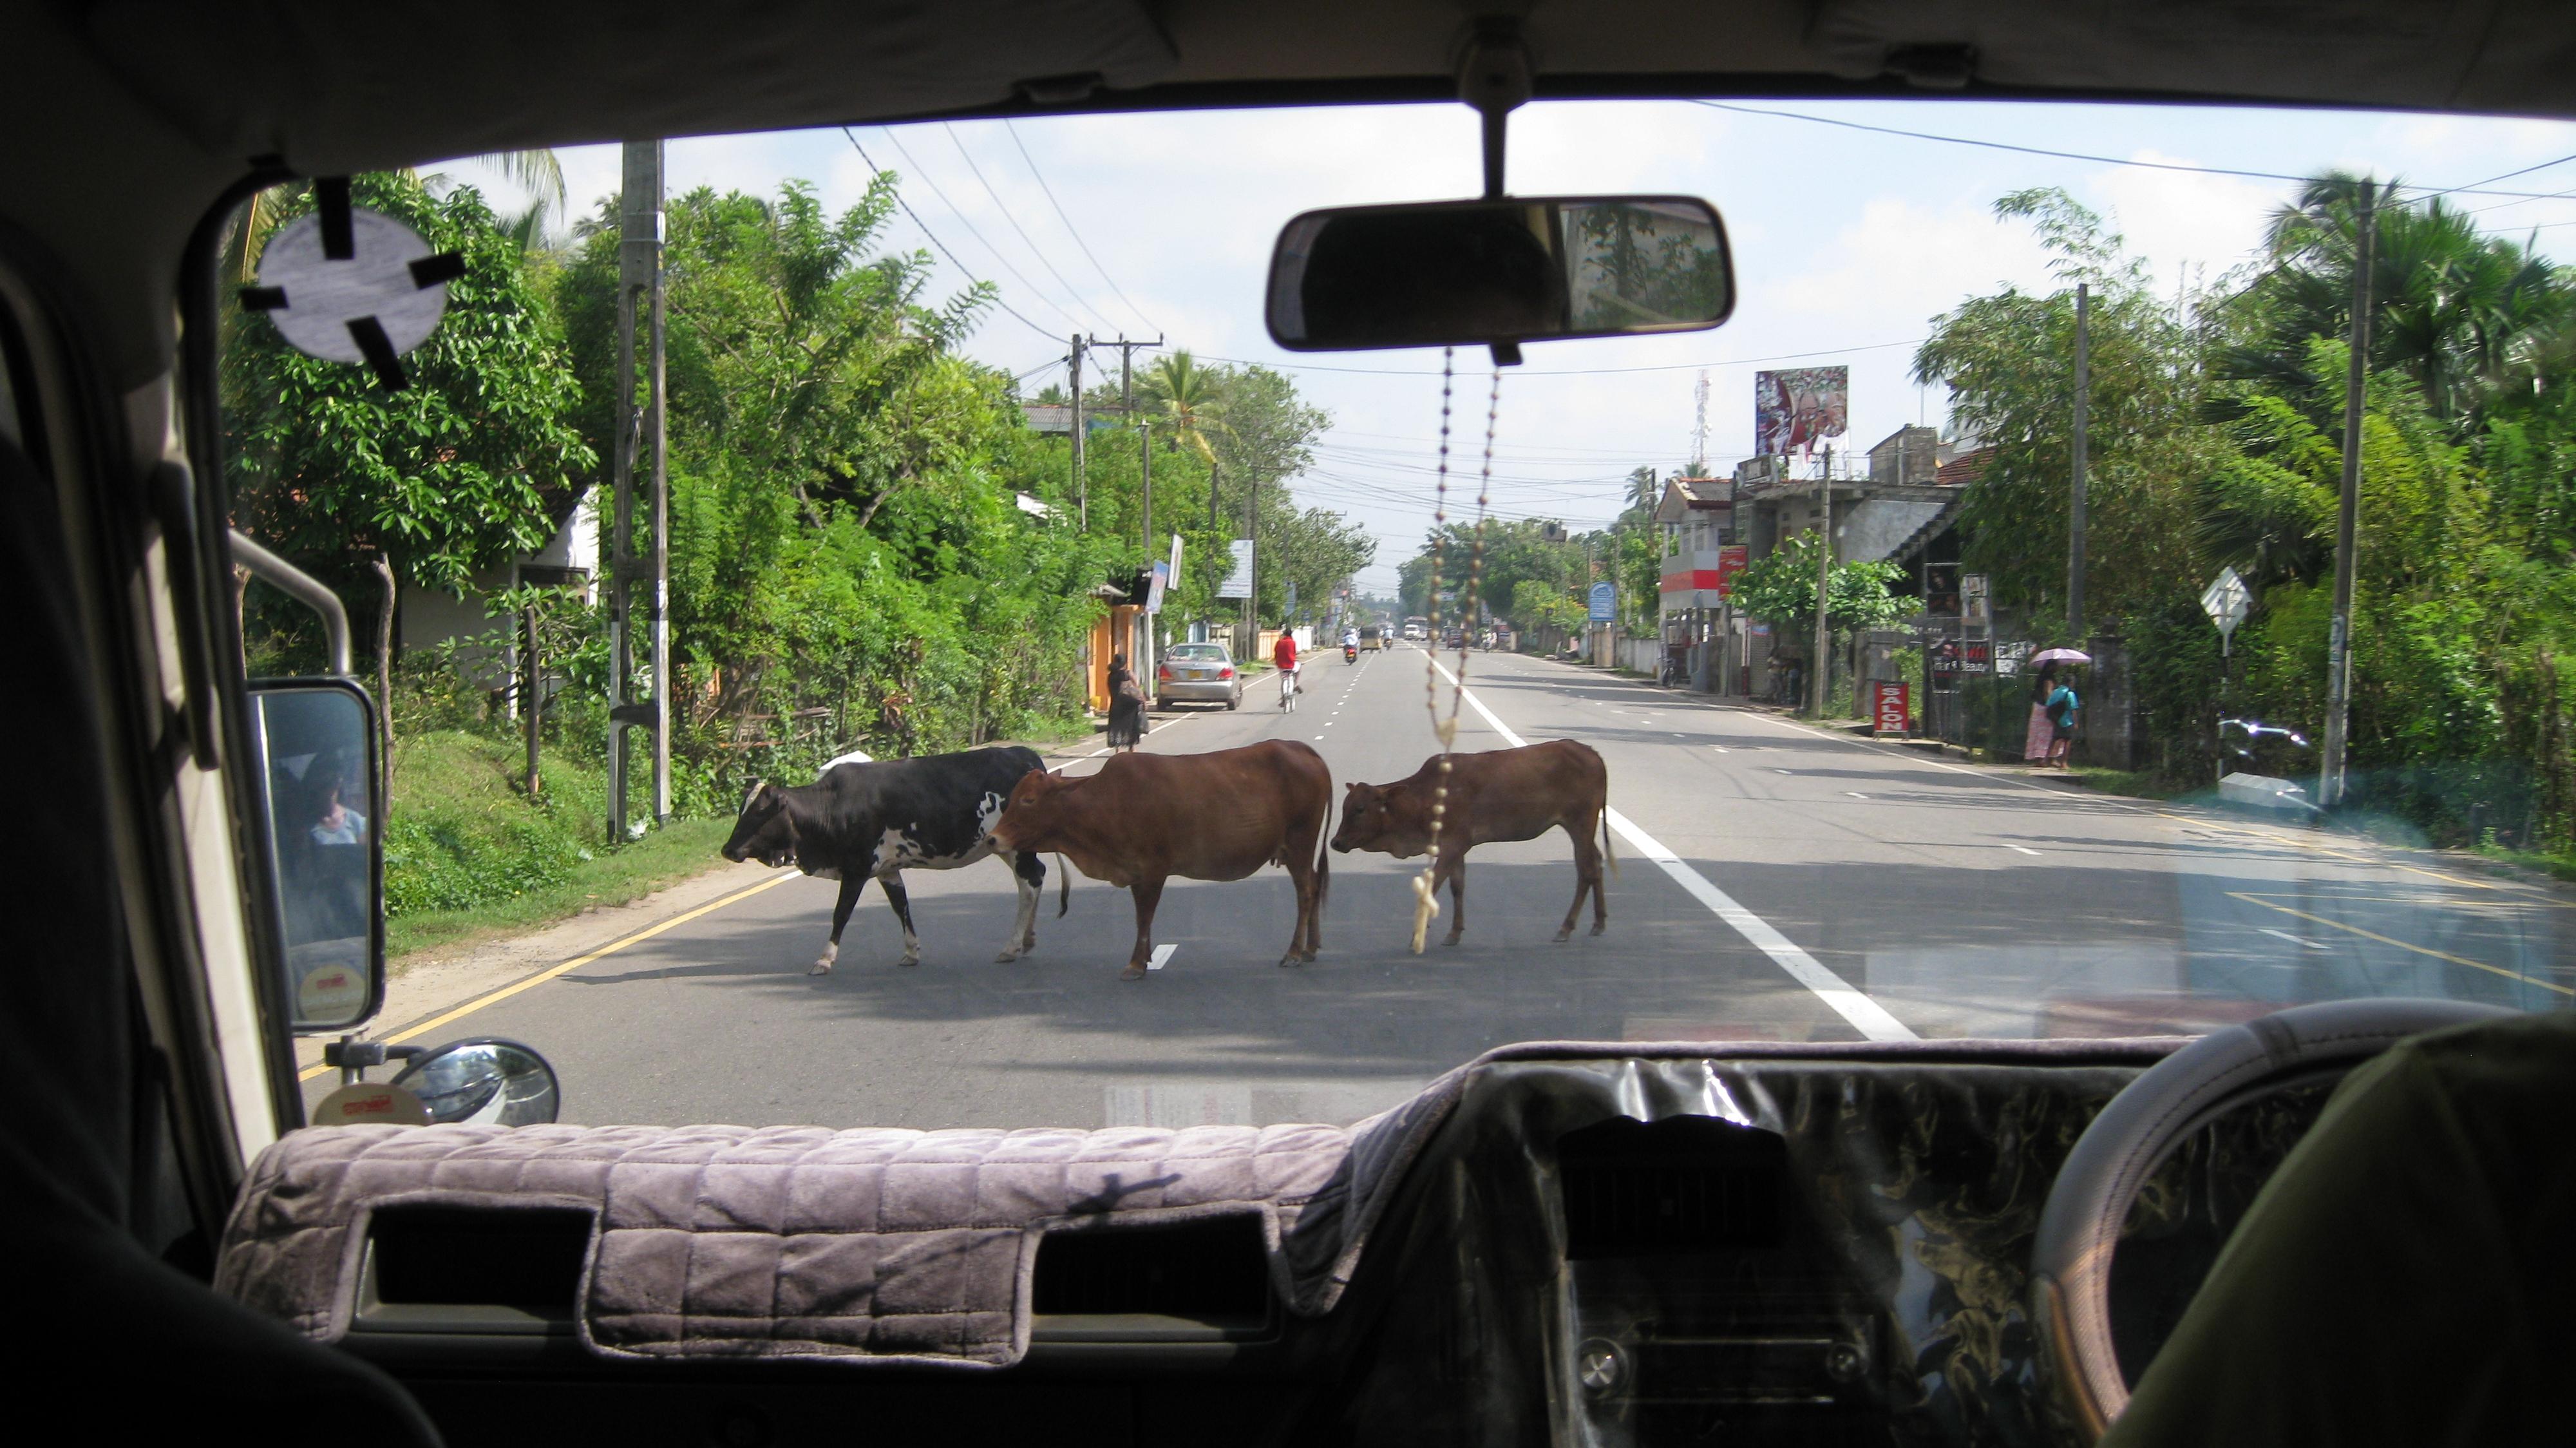 Kühe im Straßenverkehr